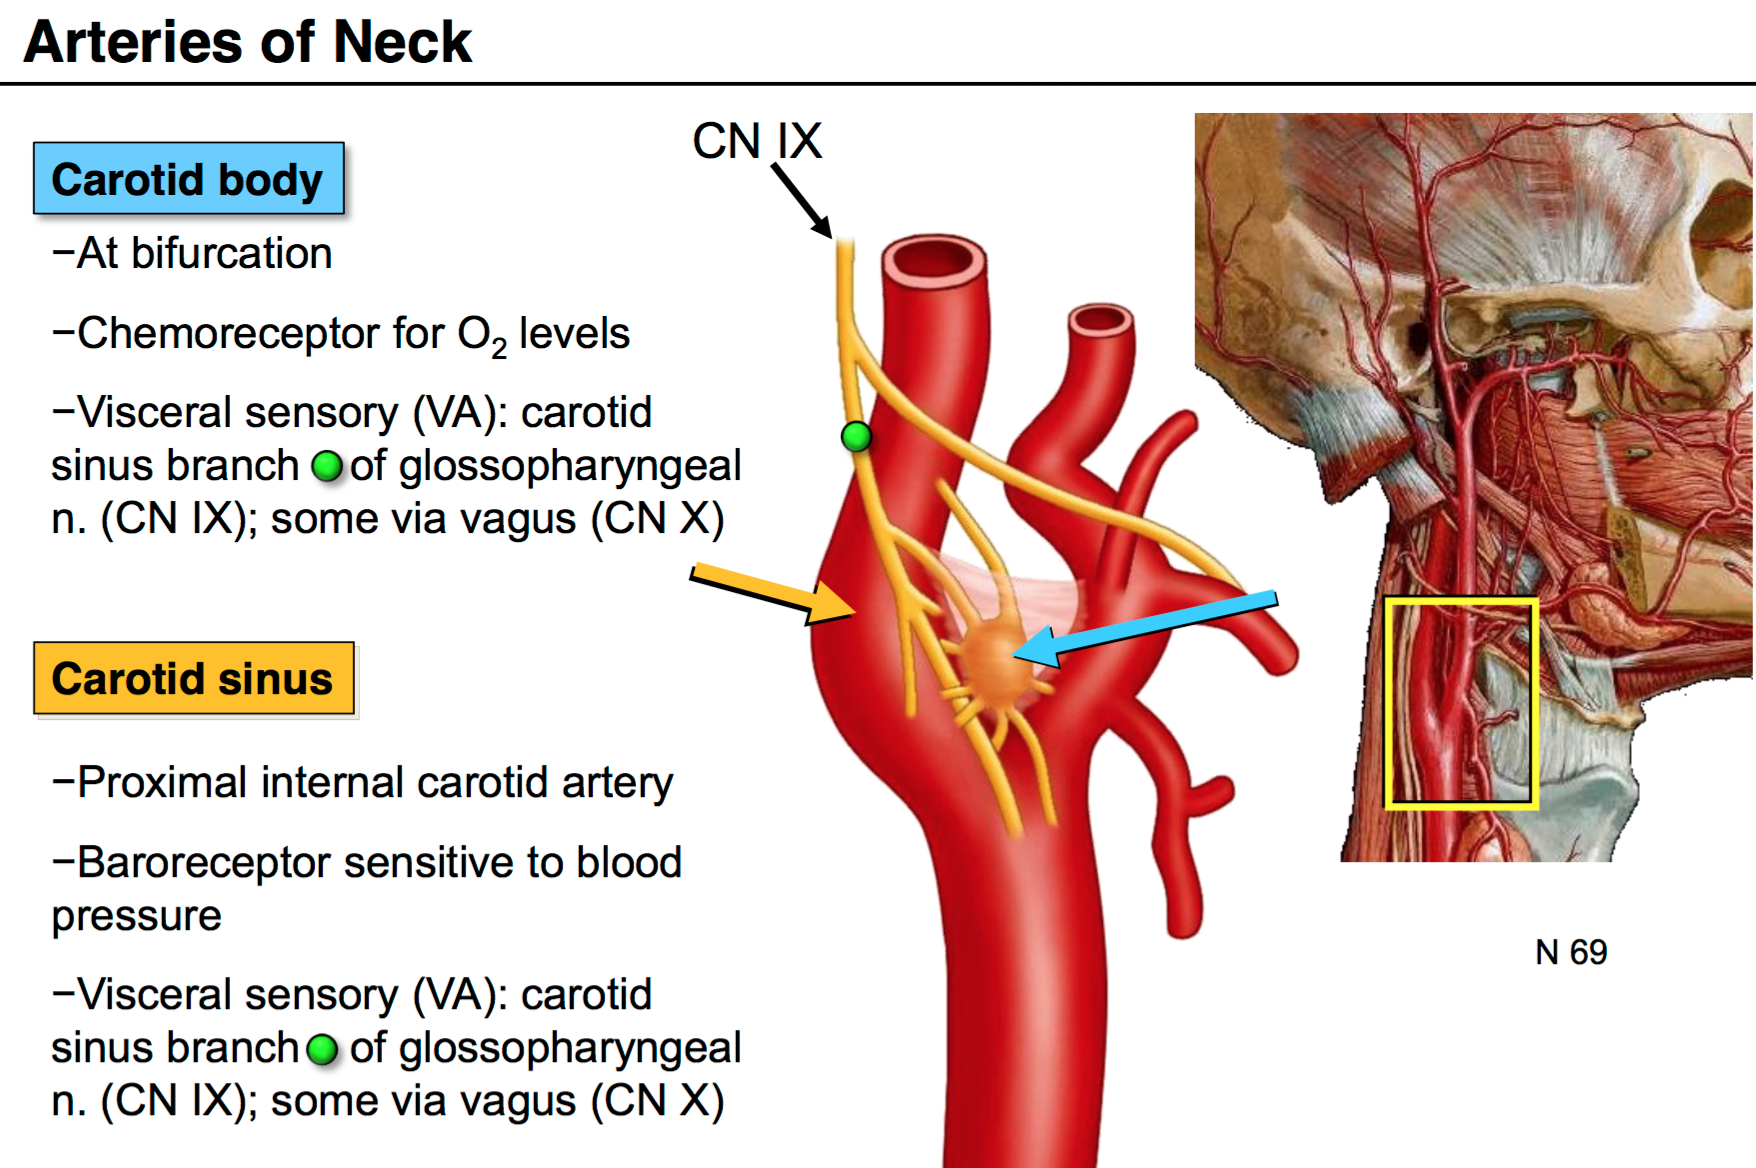 carotid body